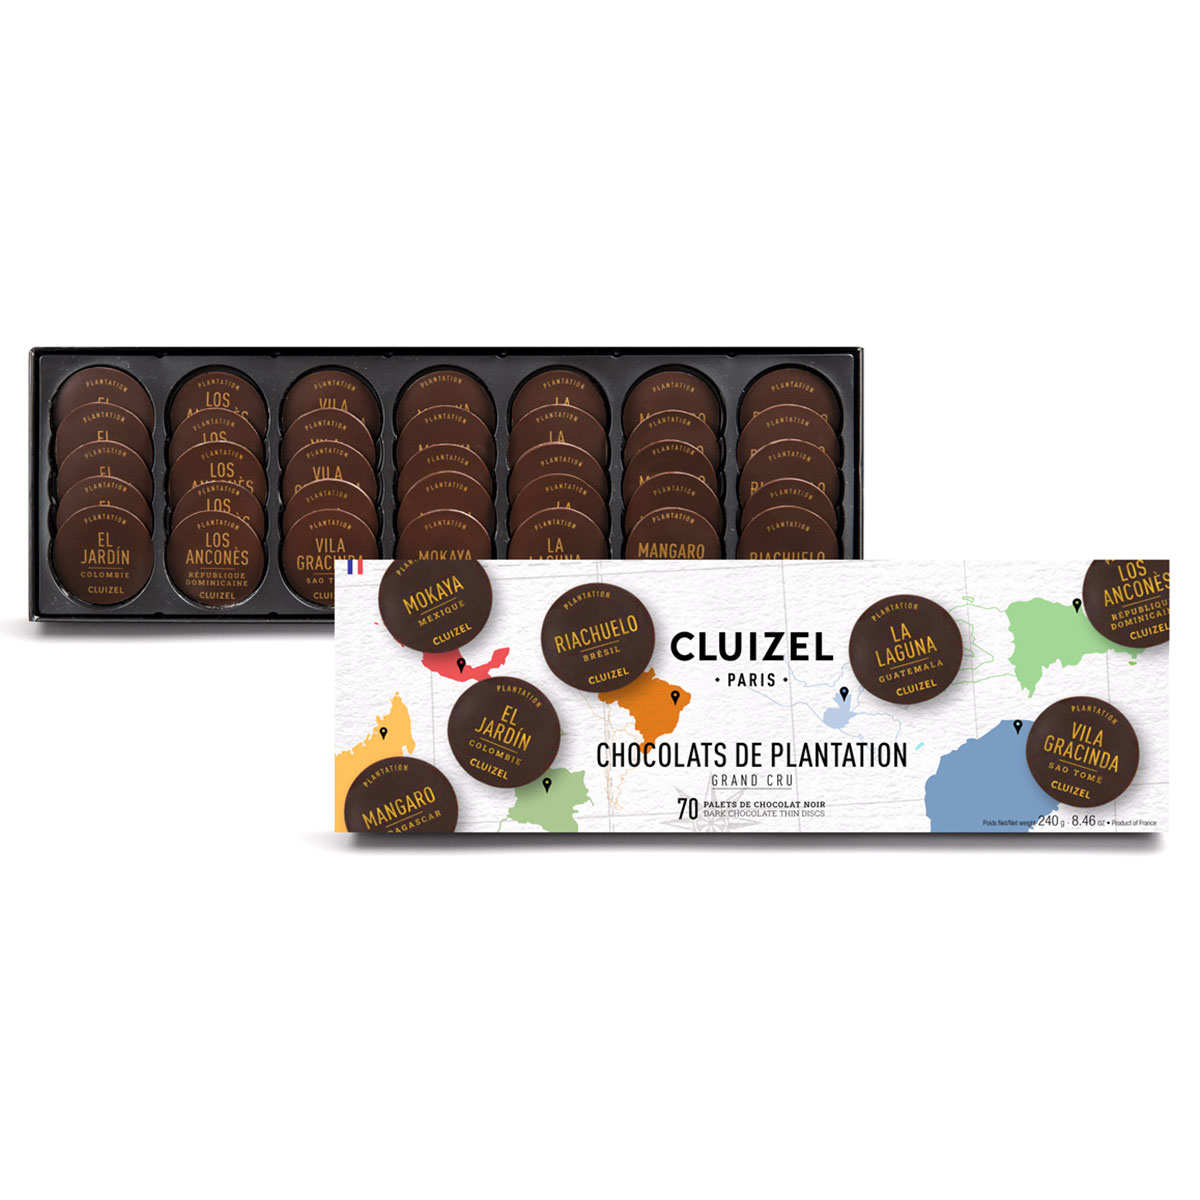 Selection of 70 Premier Cru Chocolates by Michel Cluizel